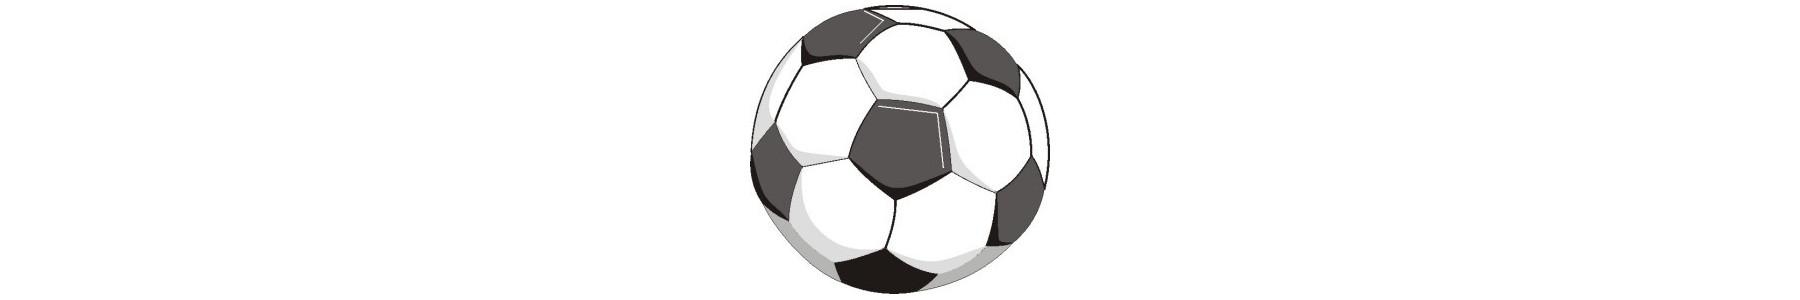 Articole party fotbal